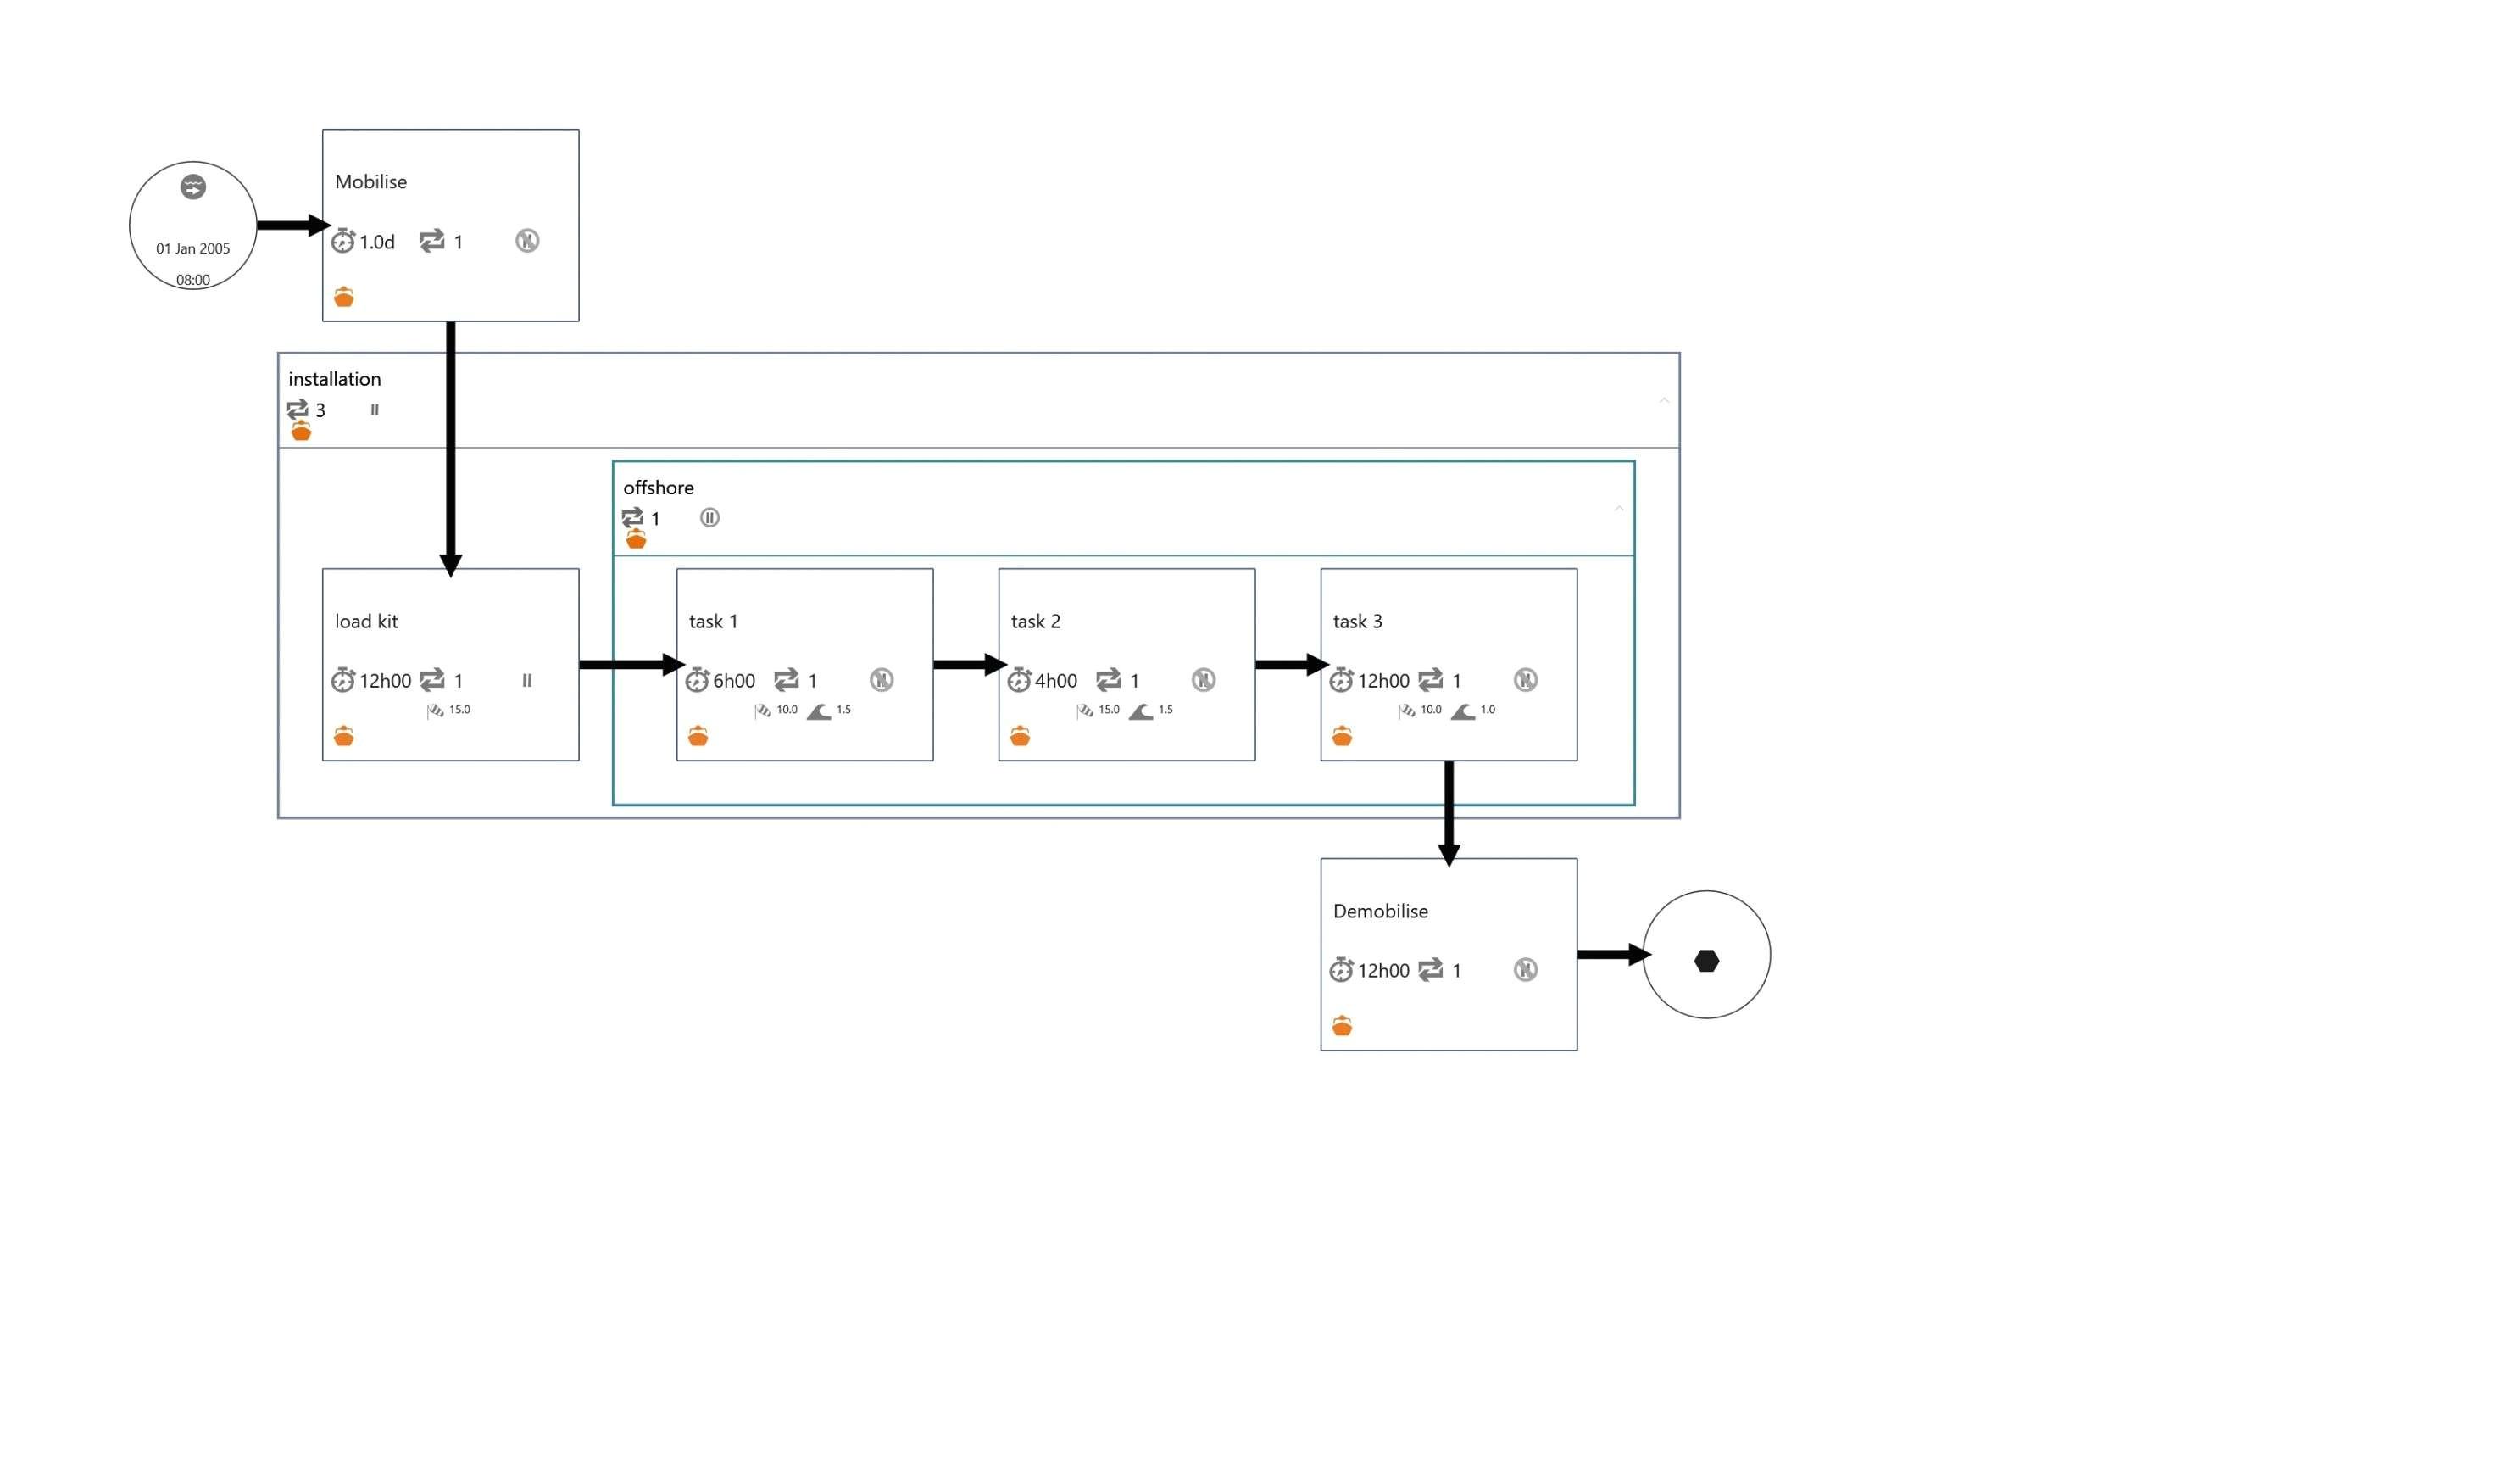 30 google docs drawing gorgeous level 0 data flow diagram data flow diagram builder new